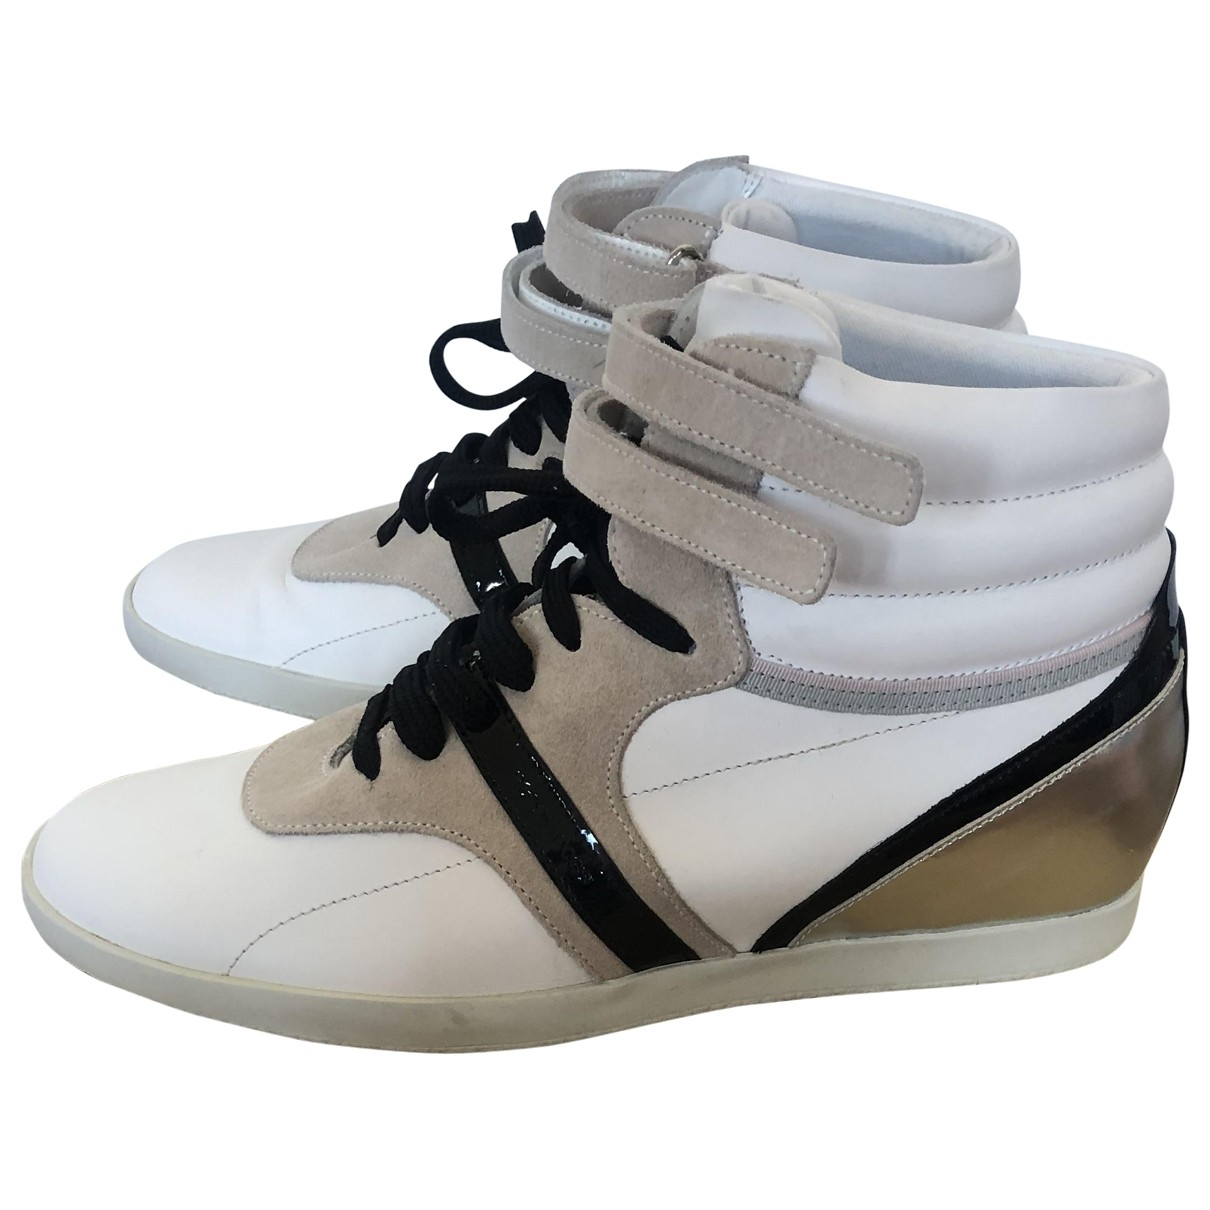 Sergio Rossi - Baskets   pour femme en cuir - blanc